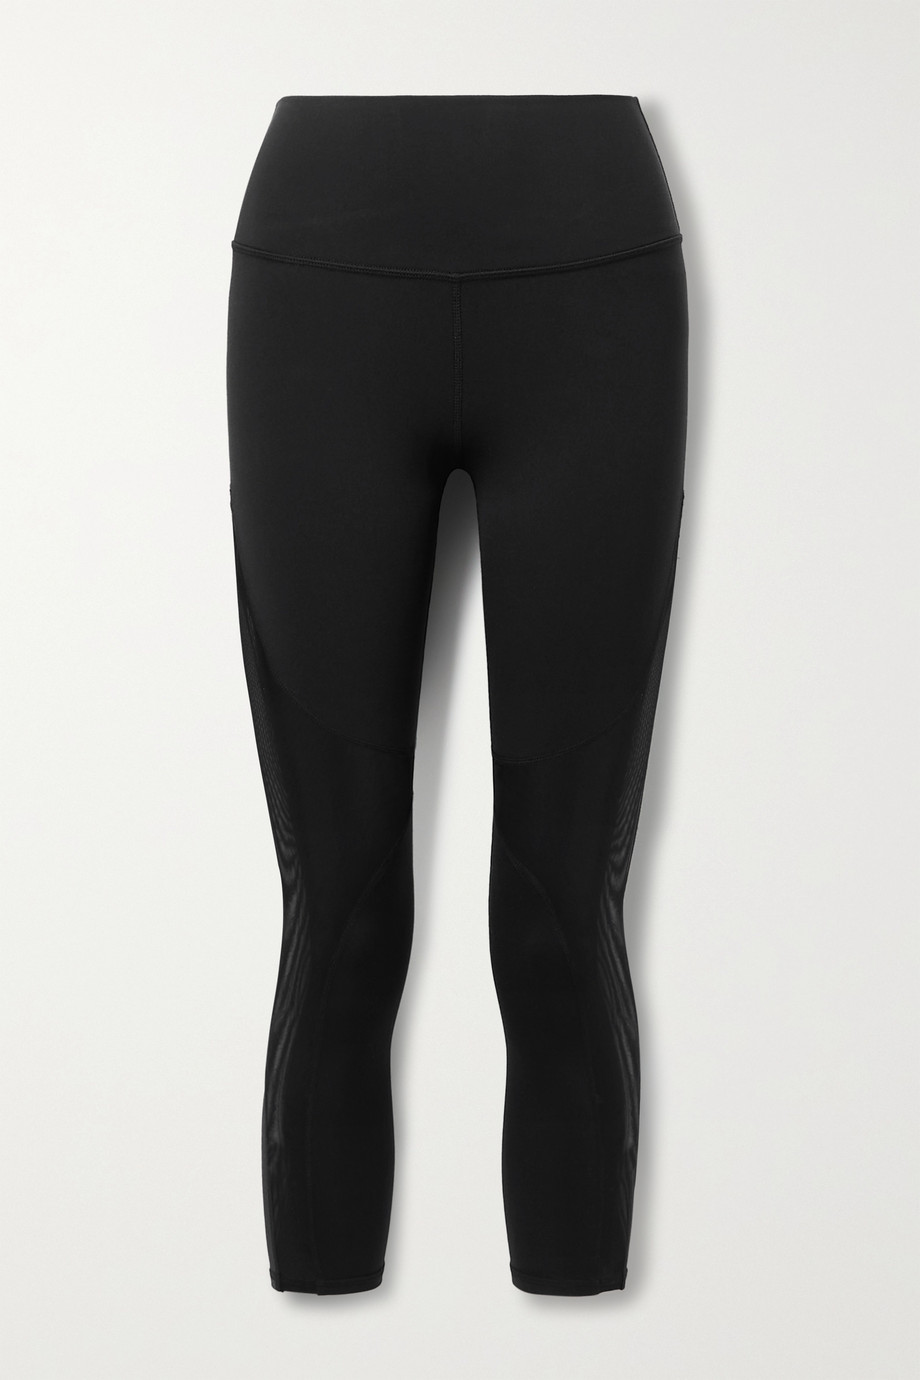 Alo Yoga Coast cropped mesh-trimmed stretch leggings